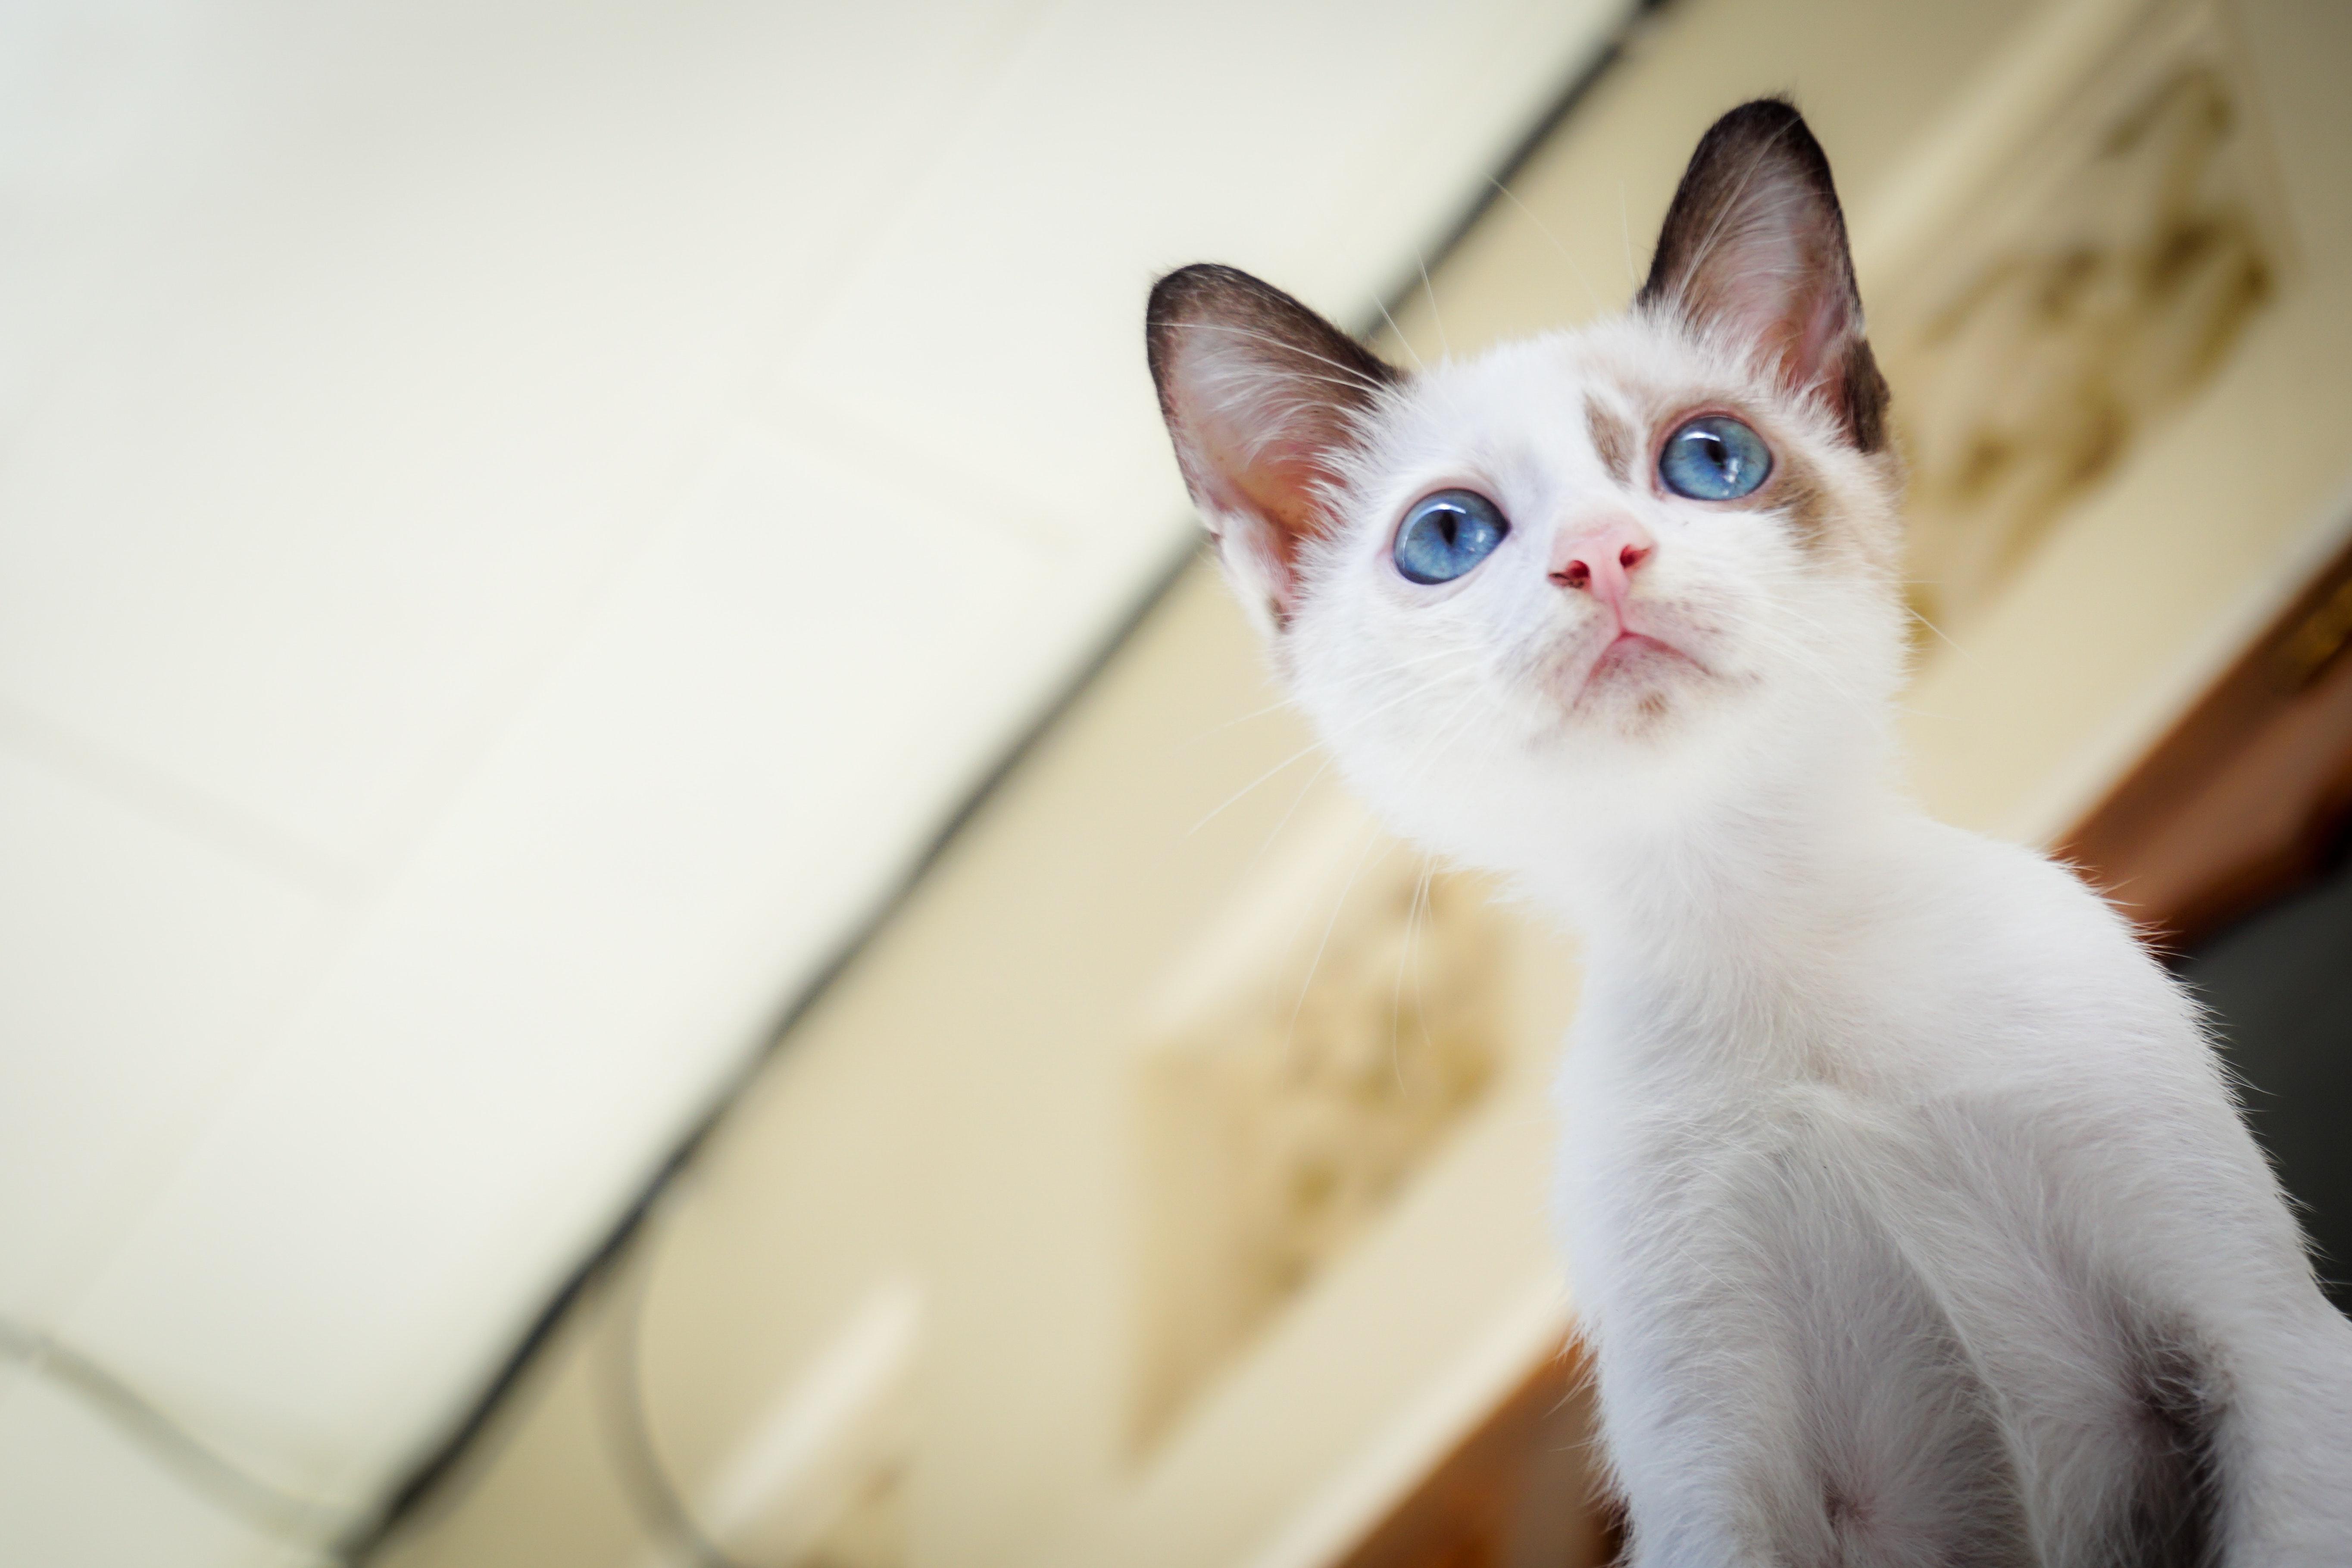 White short fur kitten with blue eyes photo